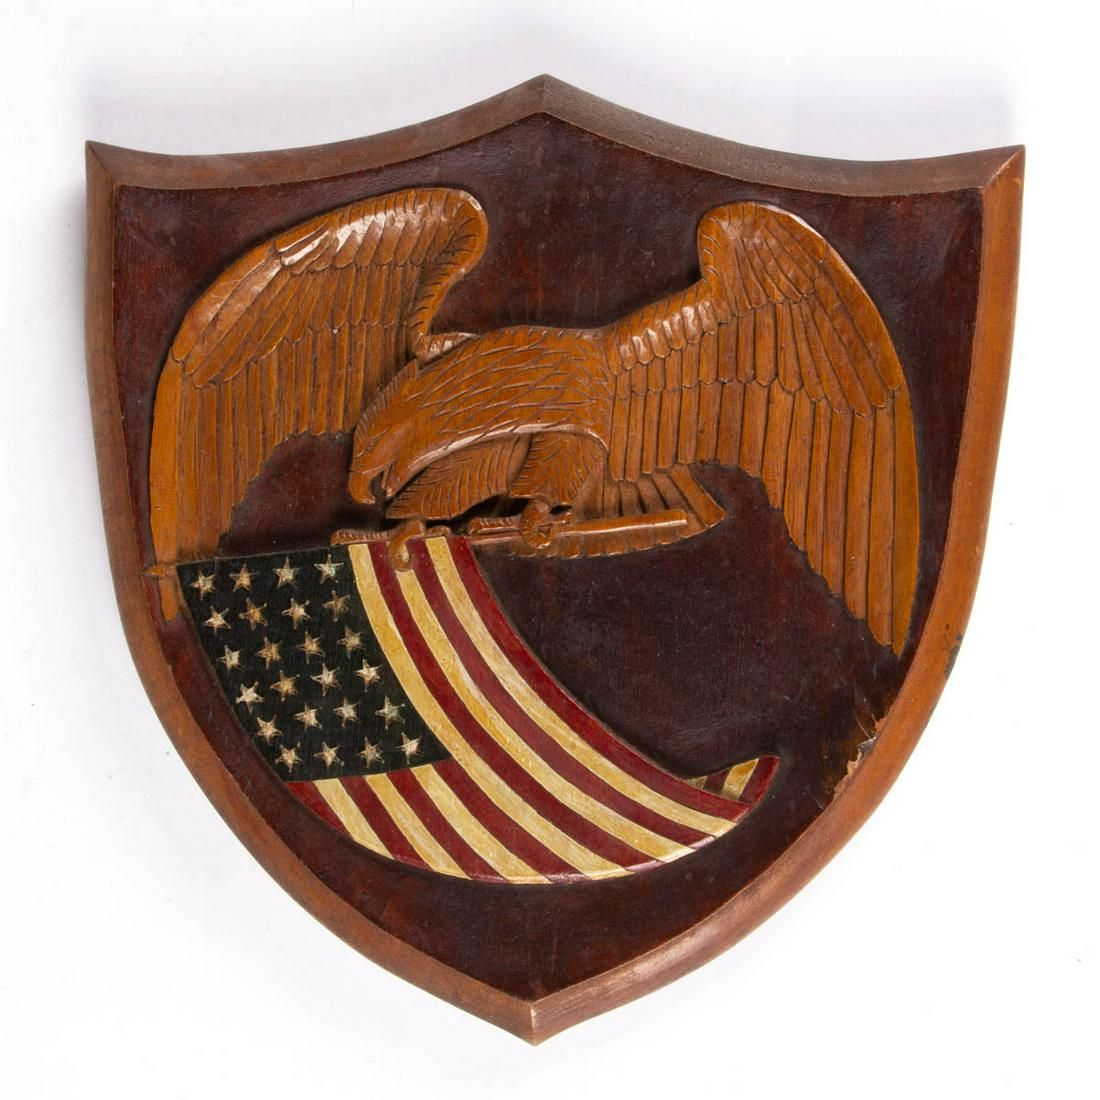 AMERICAN FOLK ART CARVED AND PAINTED HARDWOOD PATRIOTIC